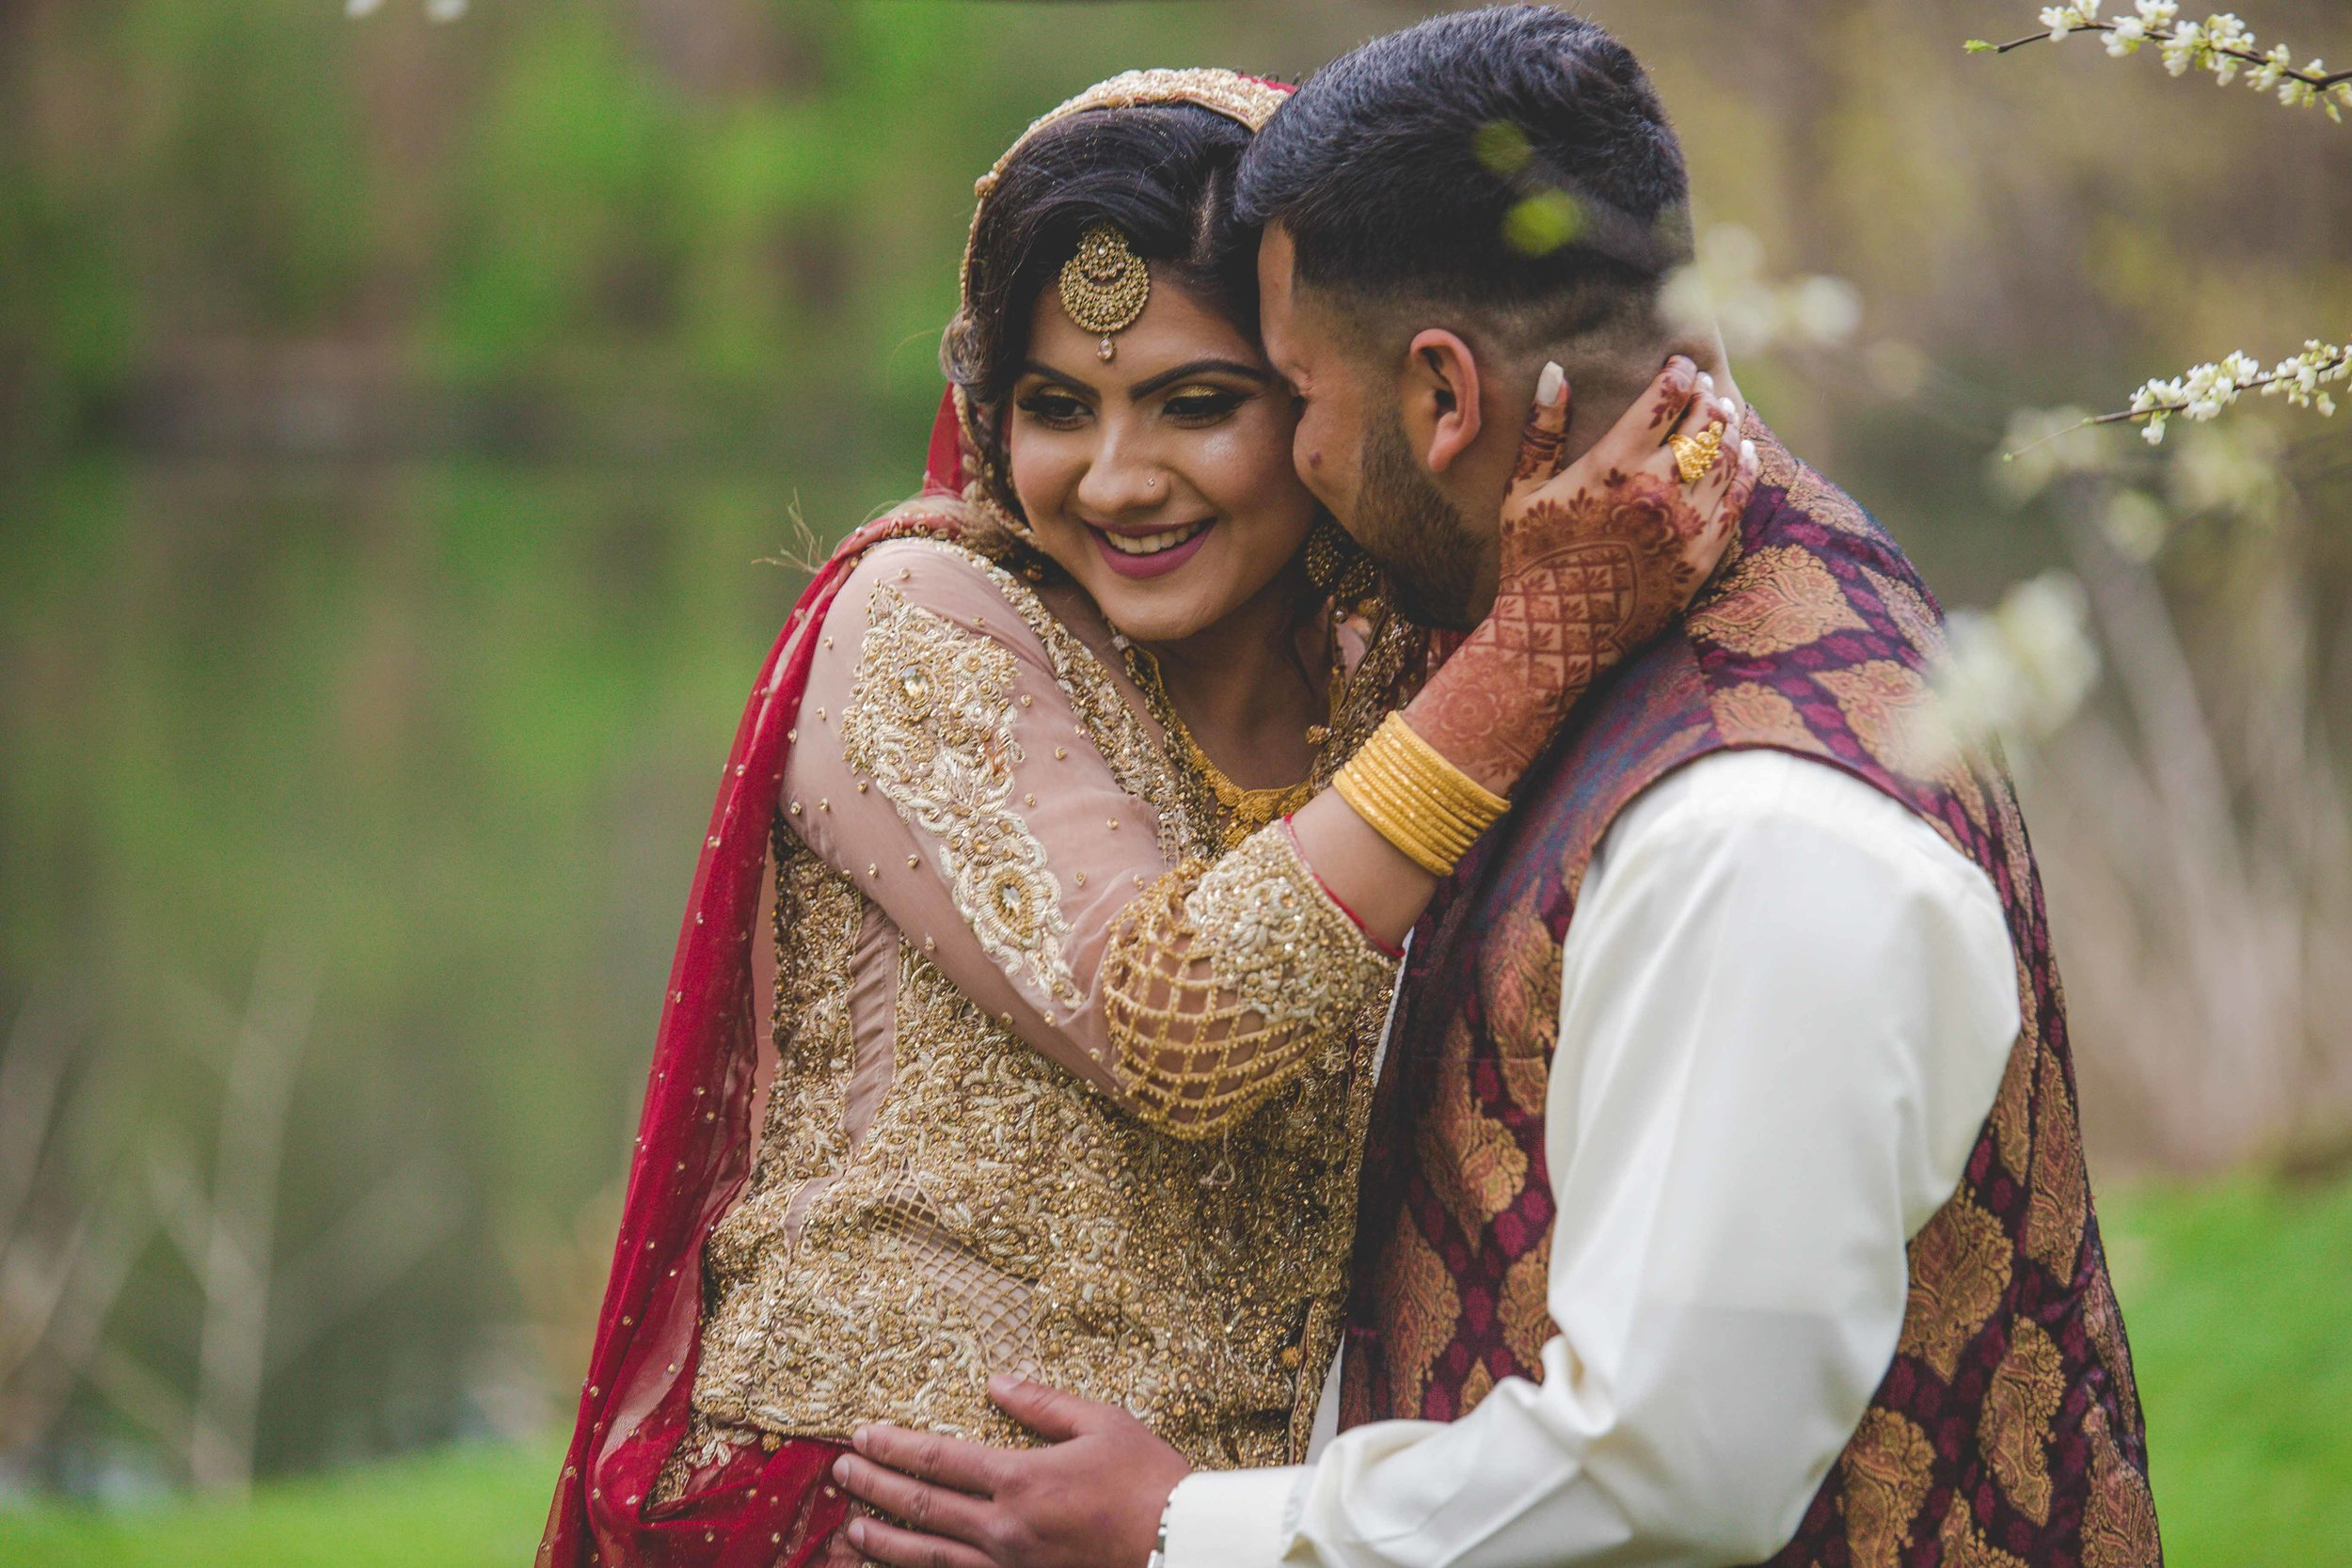 pakistani-wedding-photographer-brooklyn-new-york-41.jpg